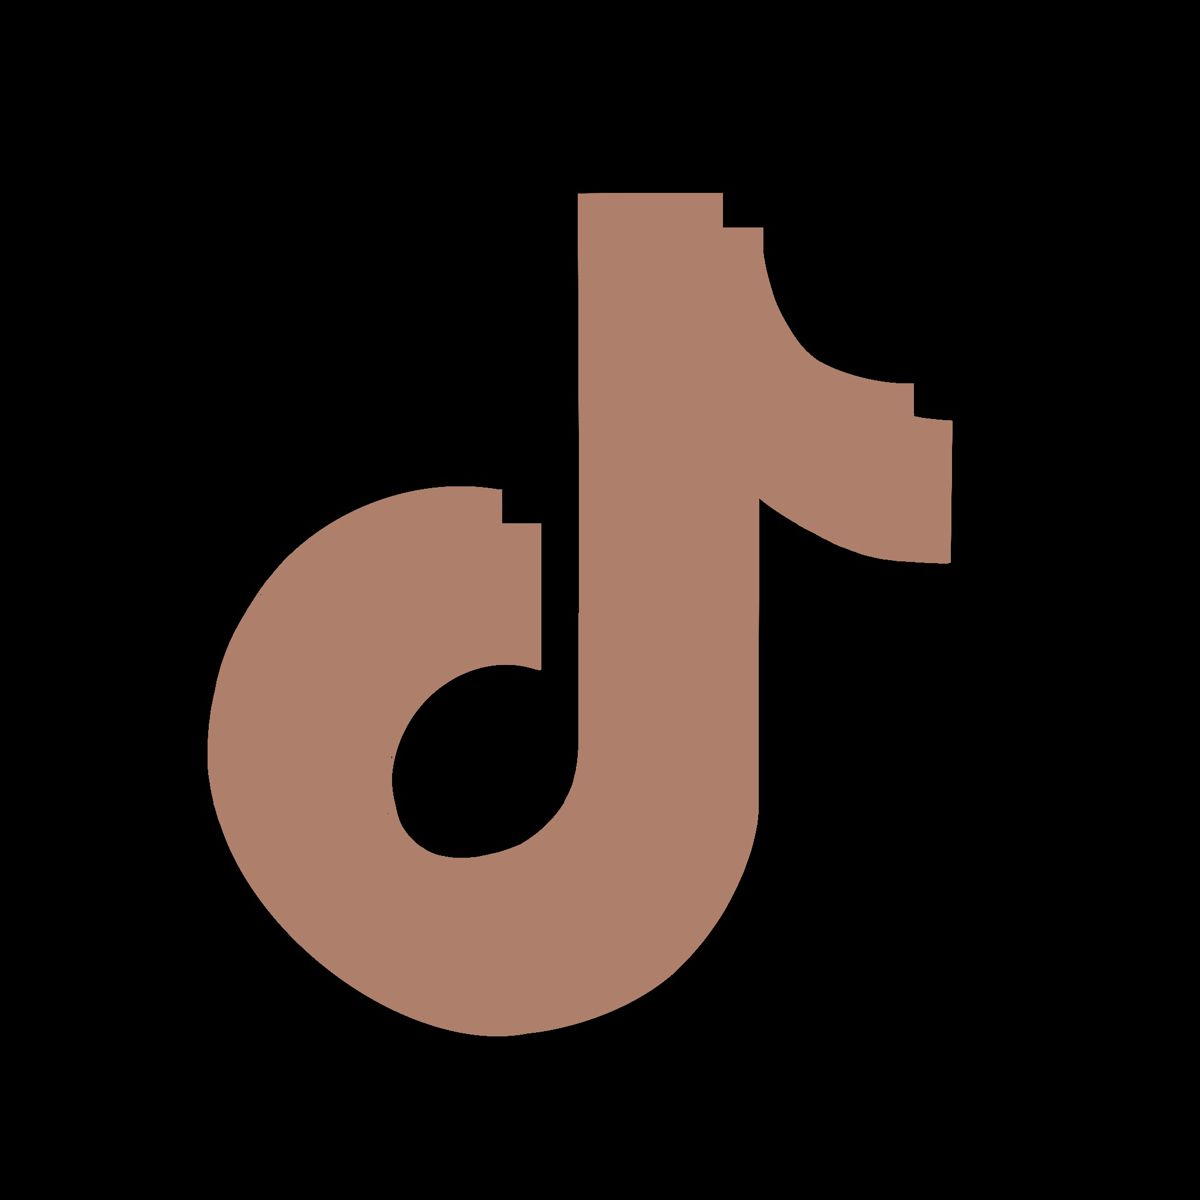 Tiktok Ios 14 Widget Logo Bintang Mobil